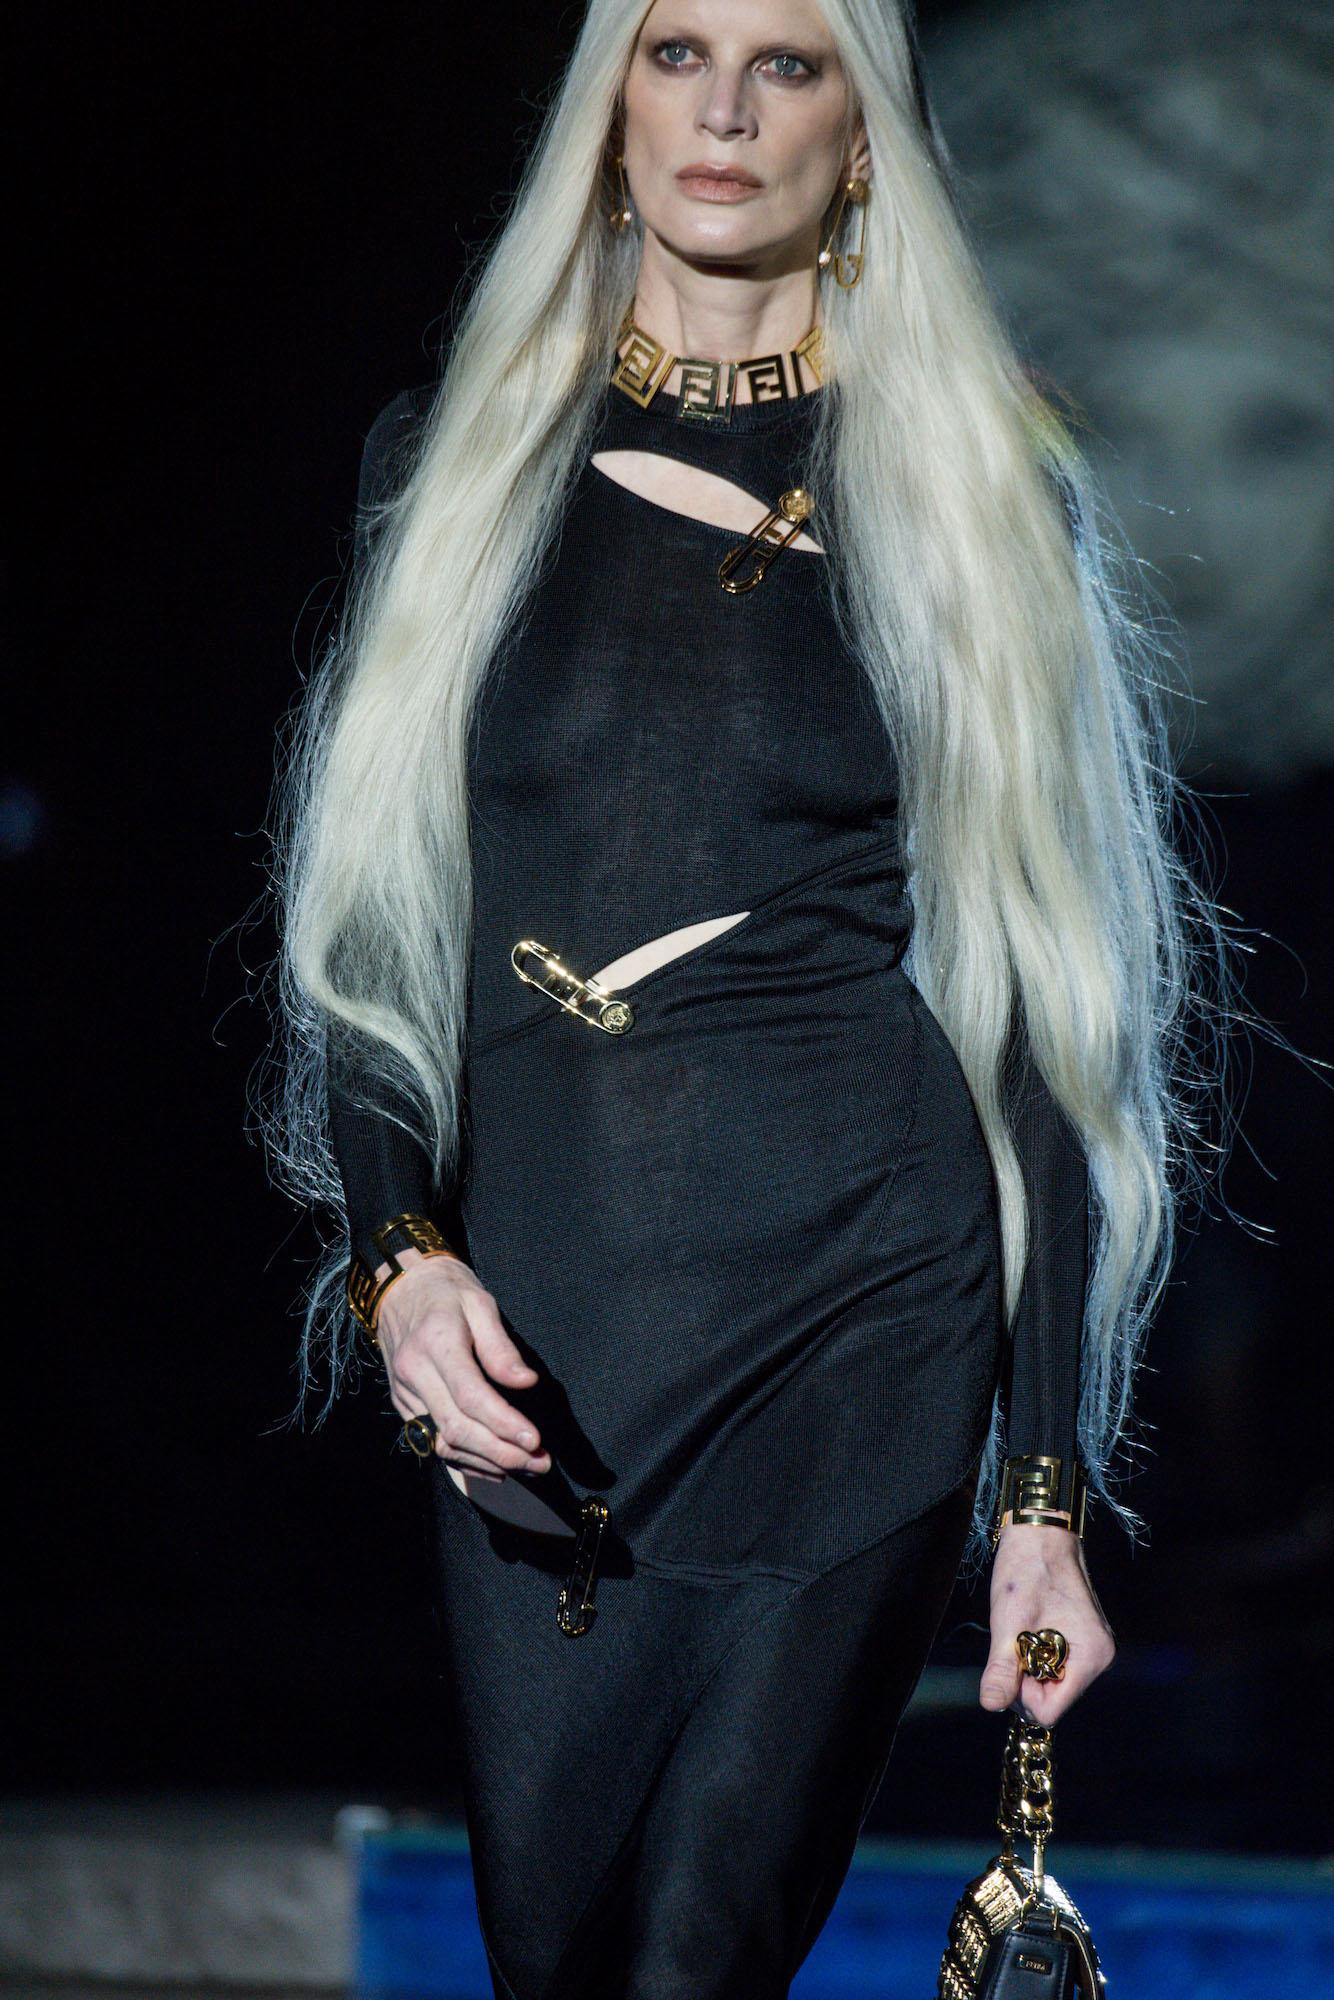 versace by fendi details (1)